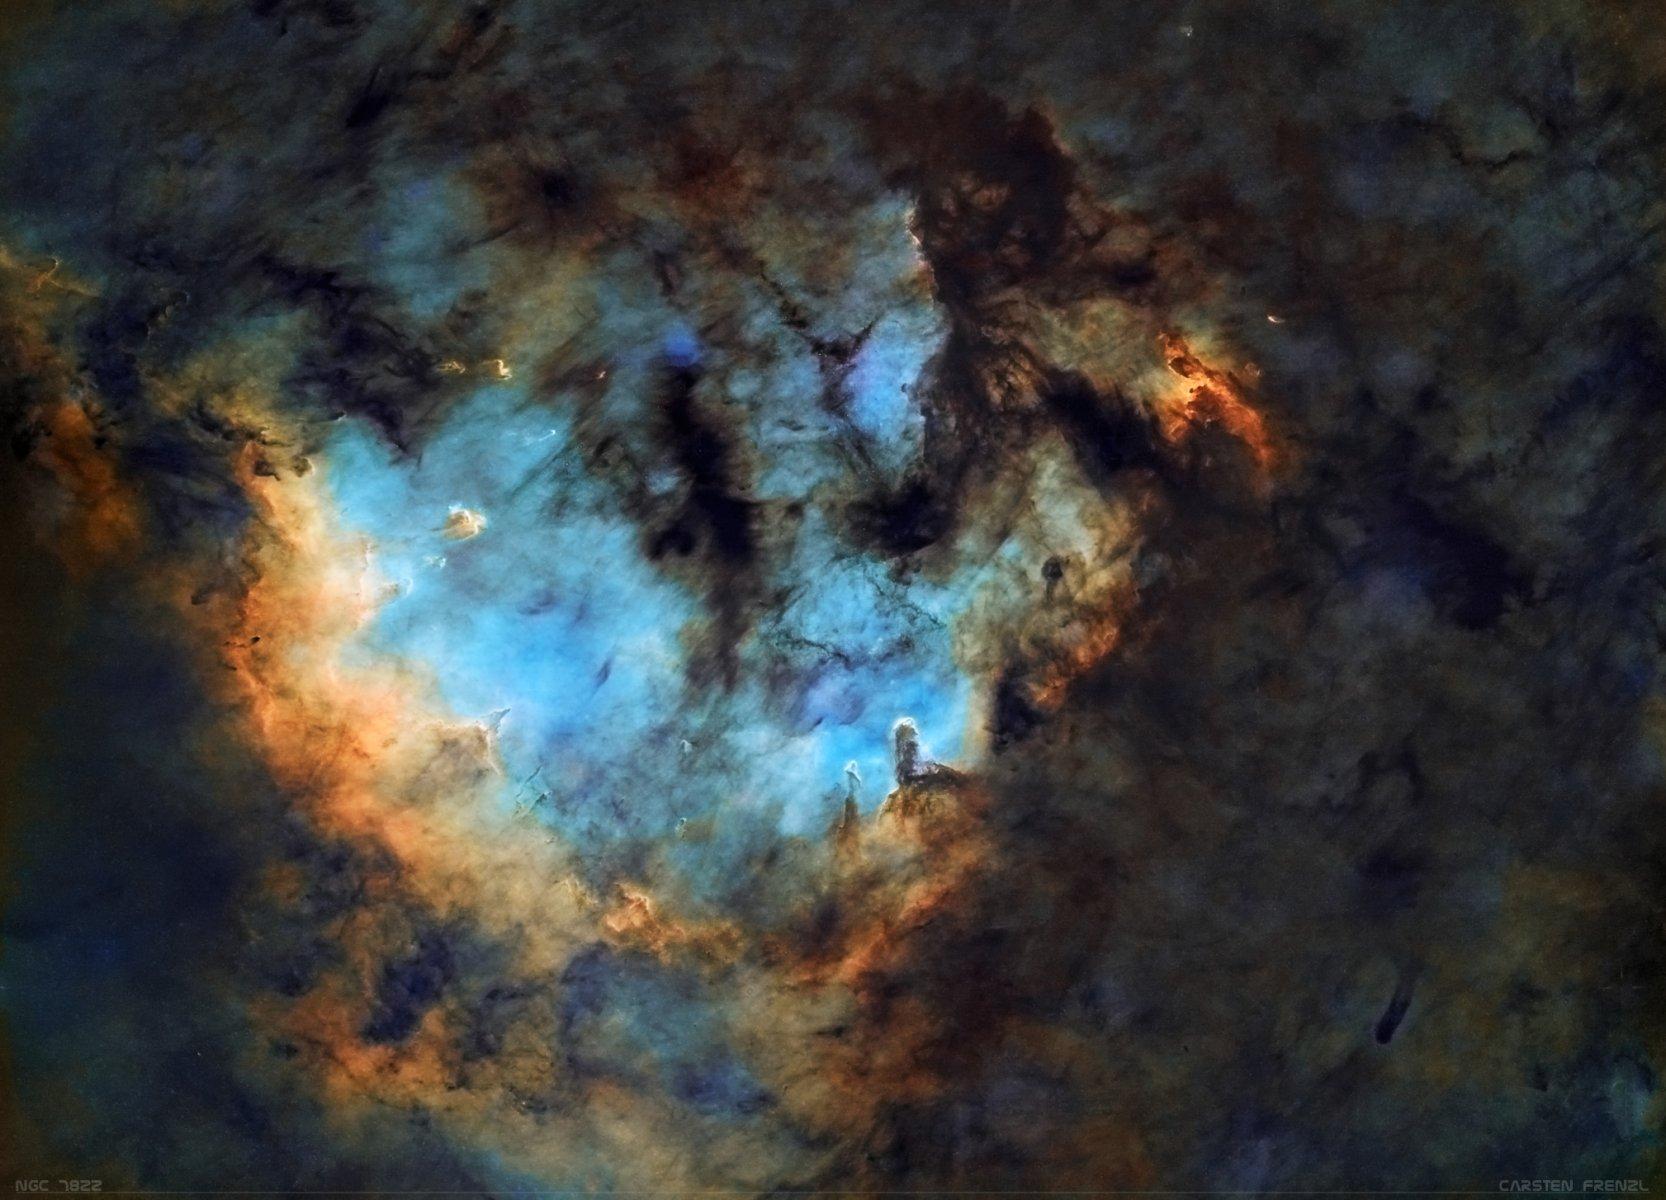 NGC7822_Starless.jpg